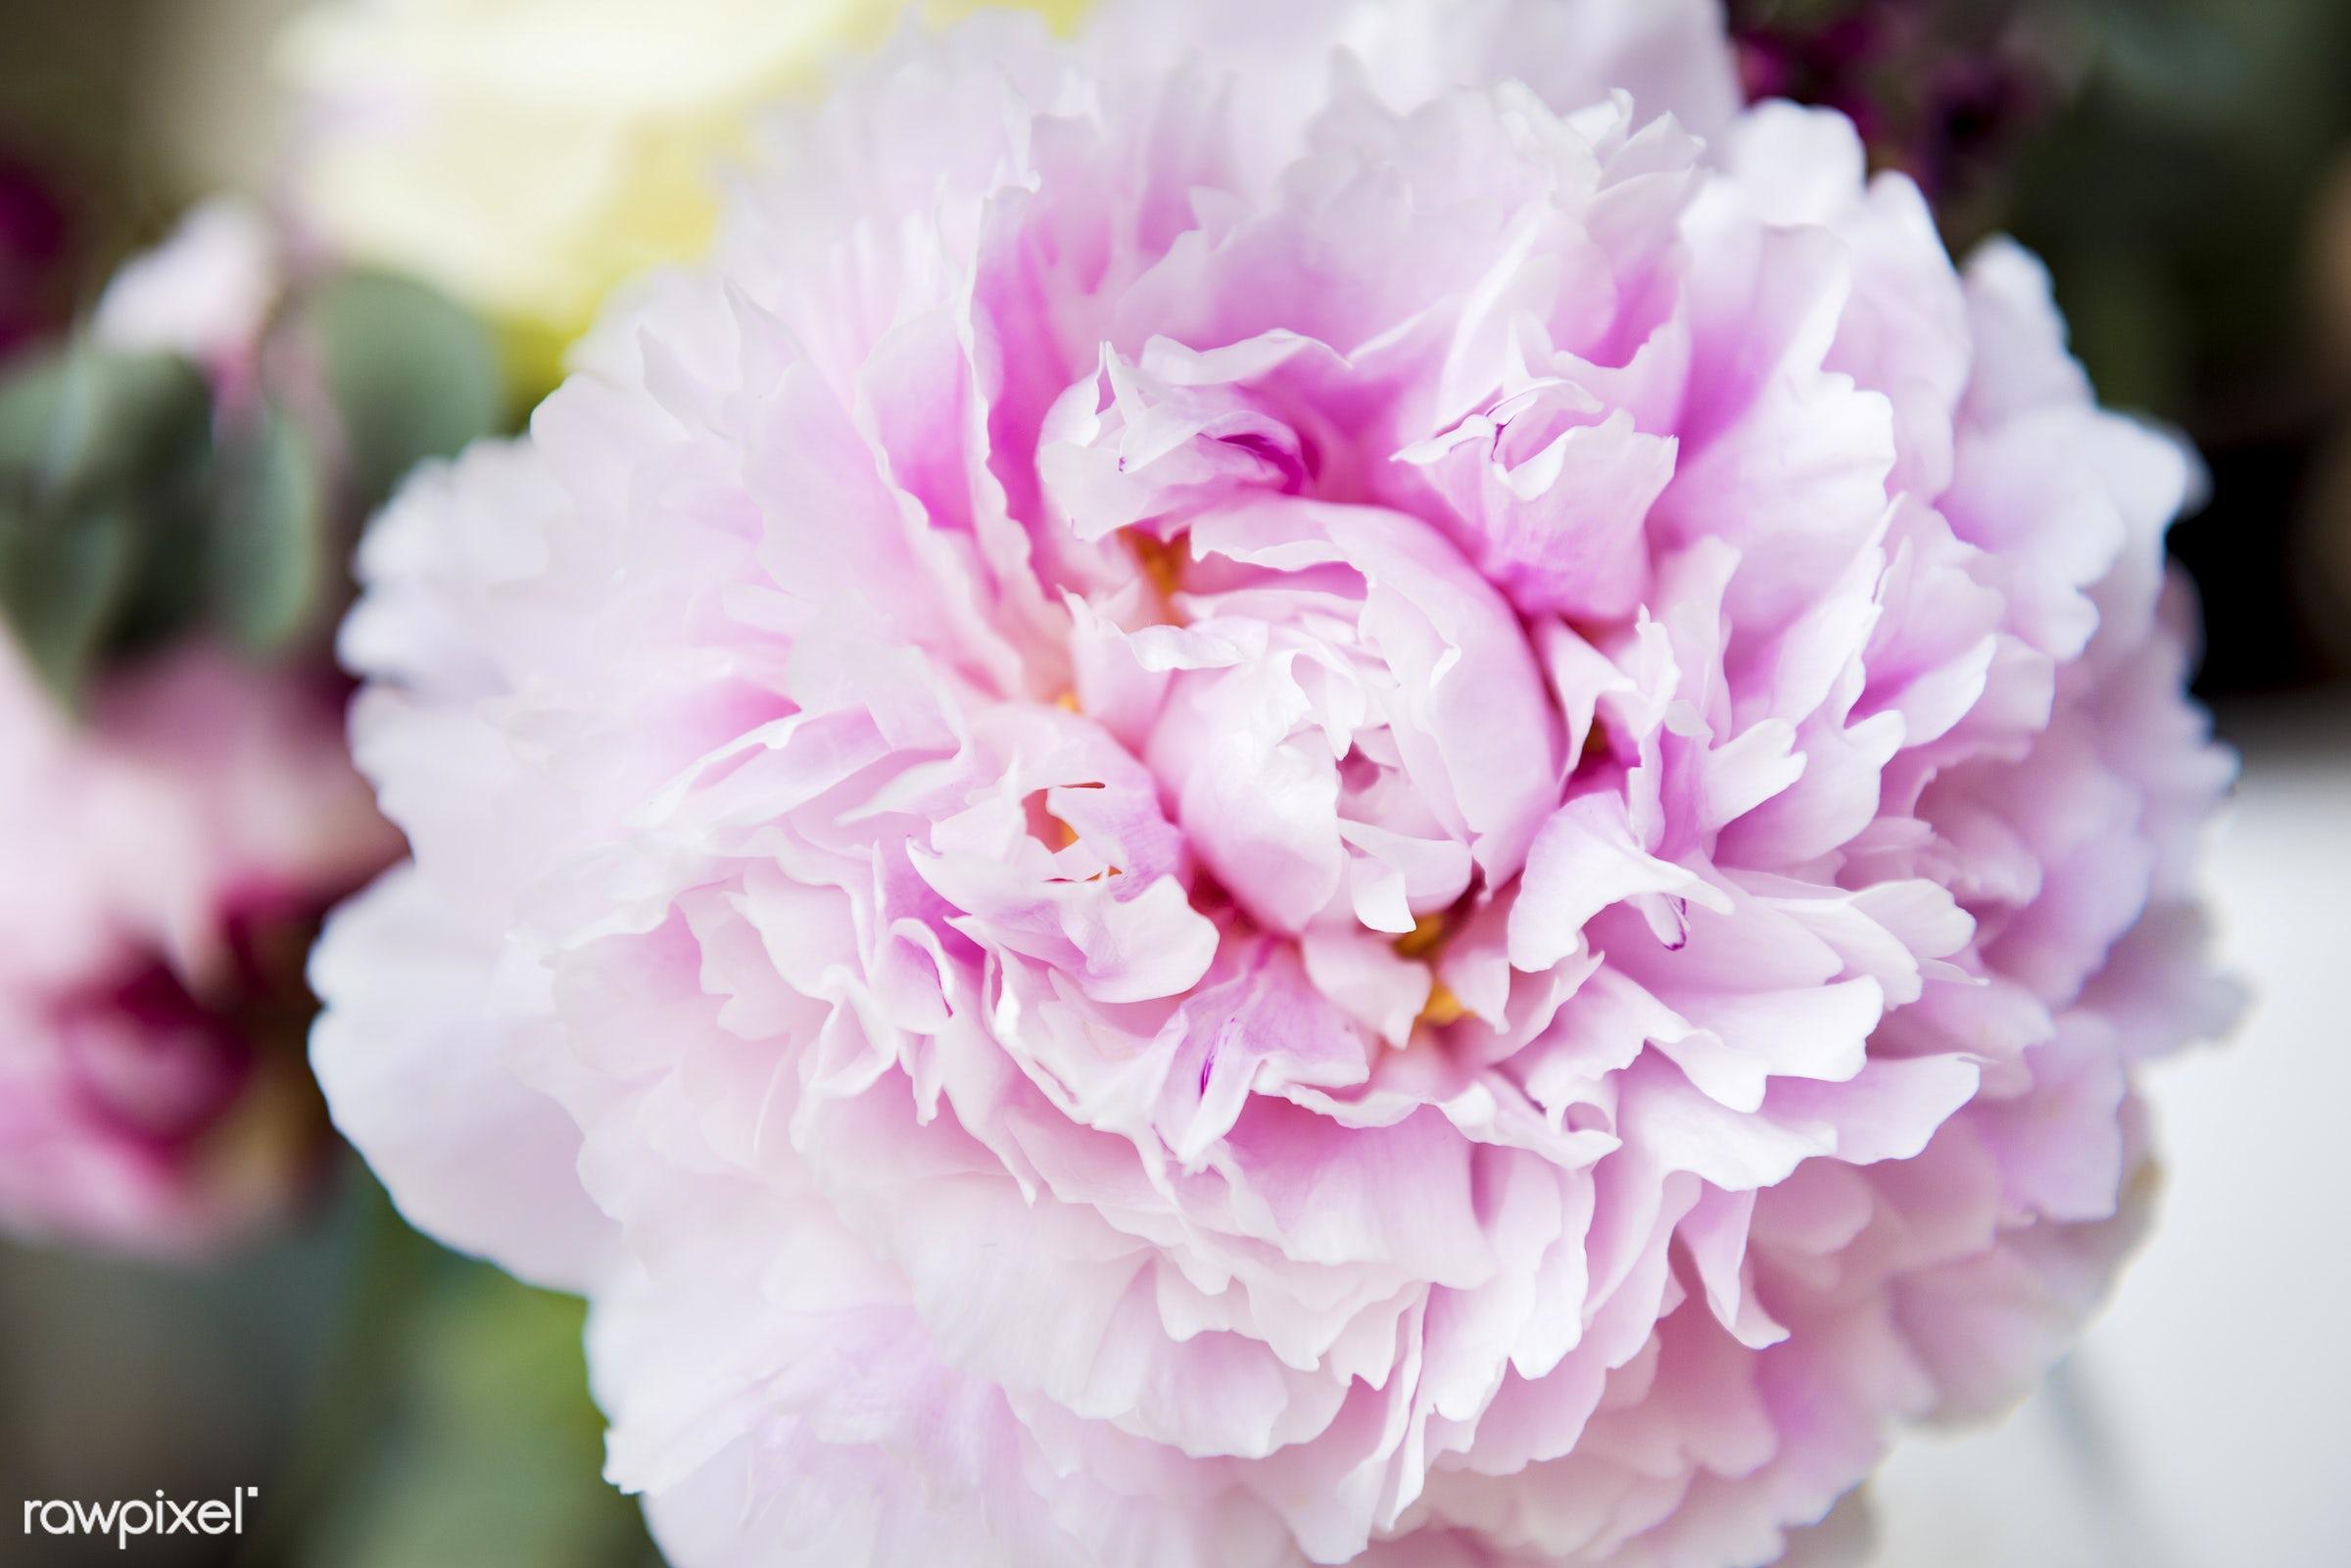 nobody, ackground, petals, flora, texture, carnation, bloom, real, nature, fresh, pink, natural, flower, closeup